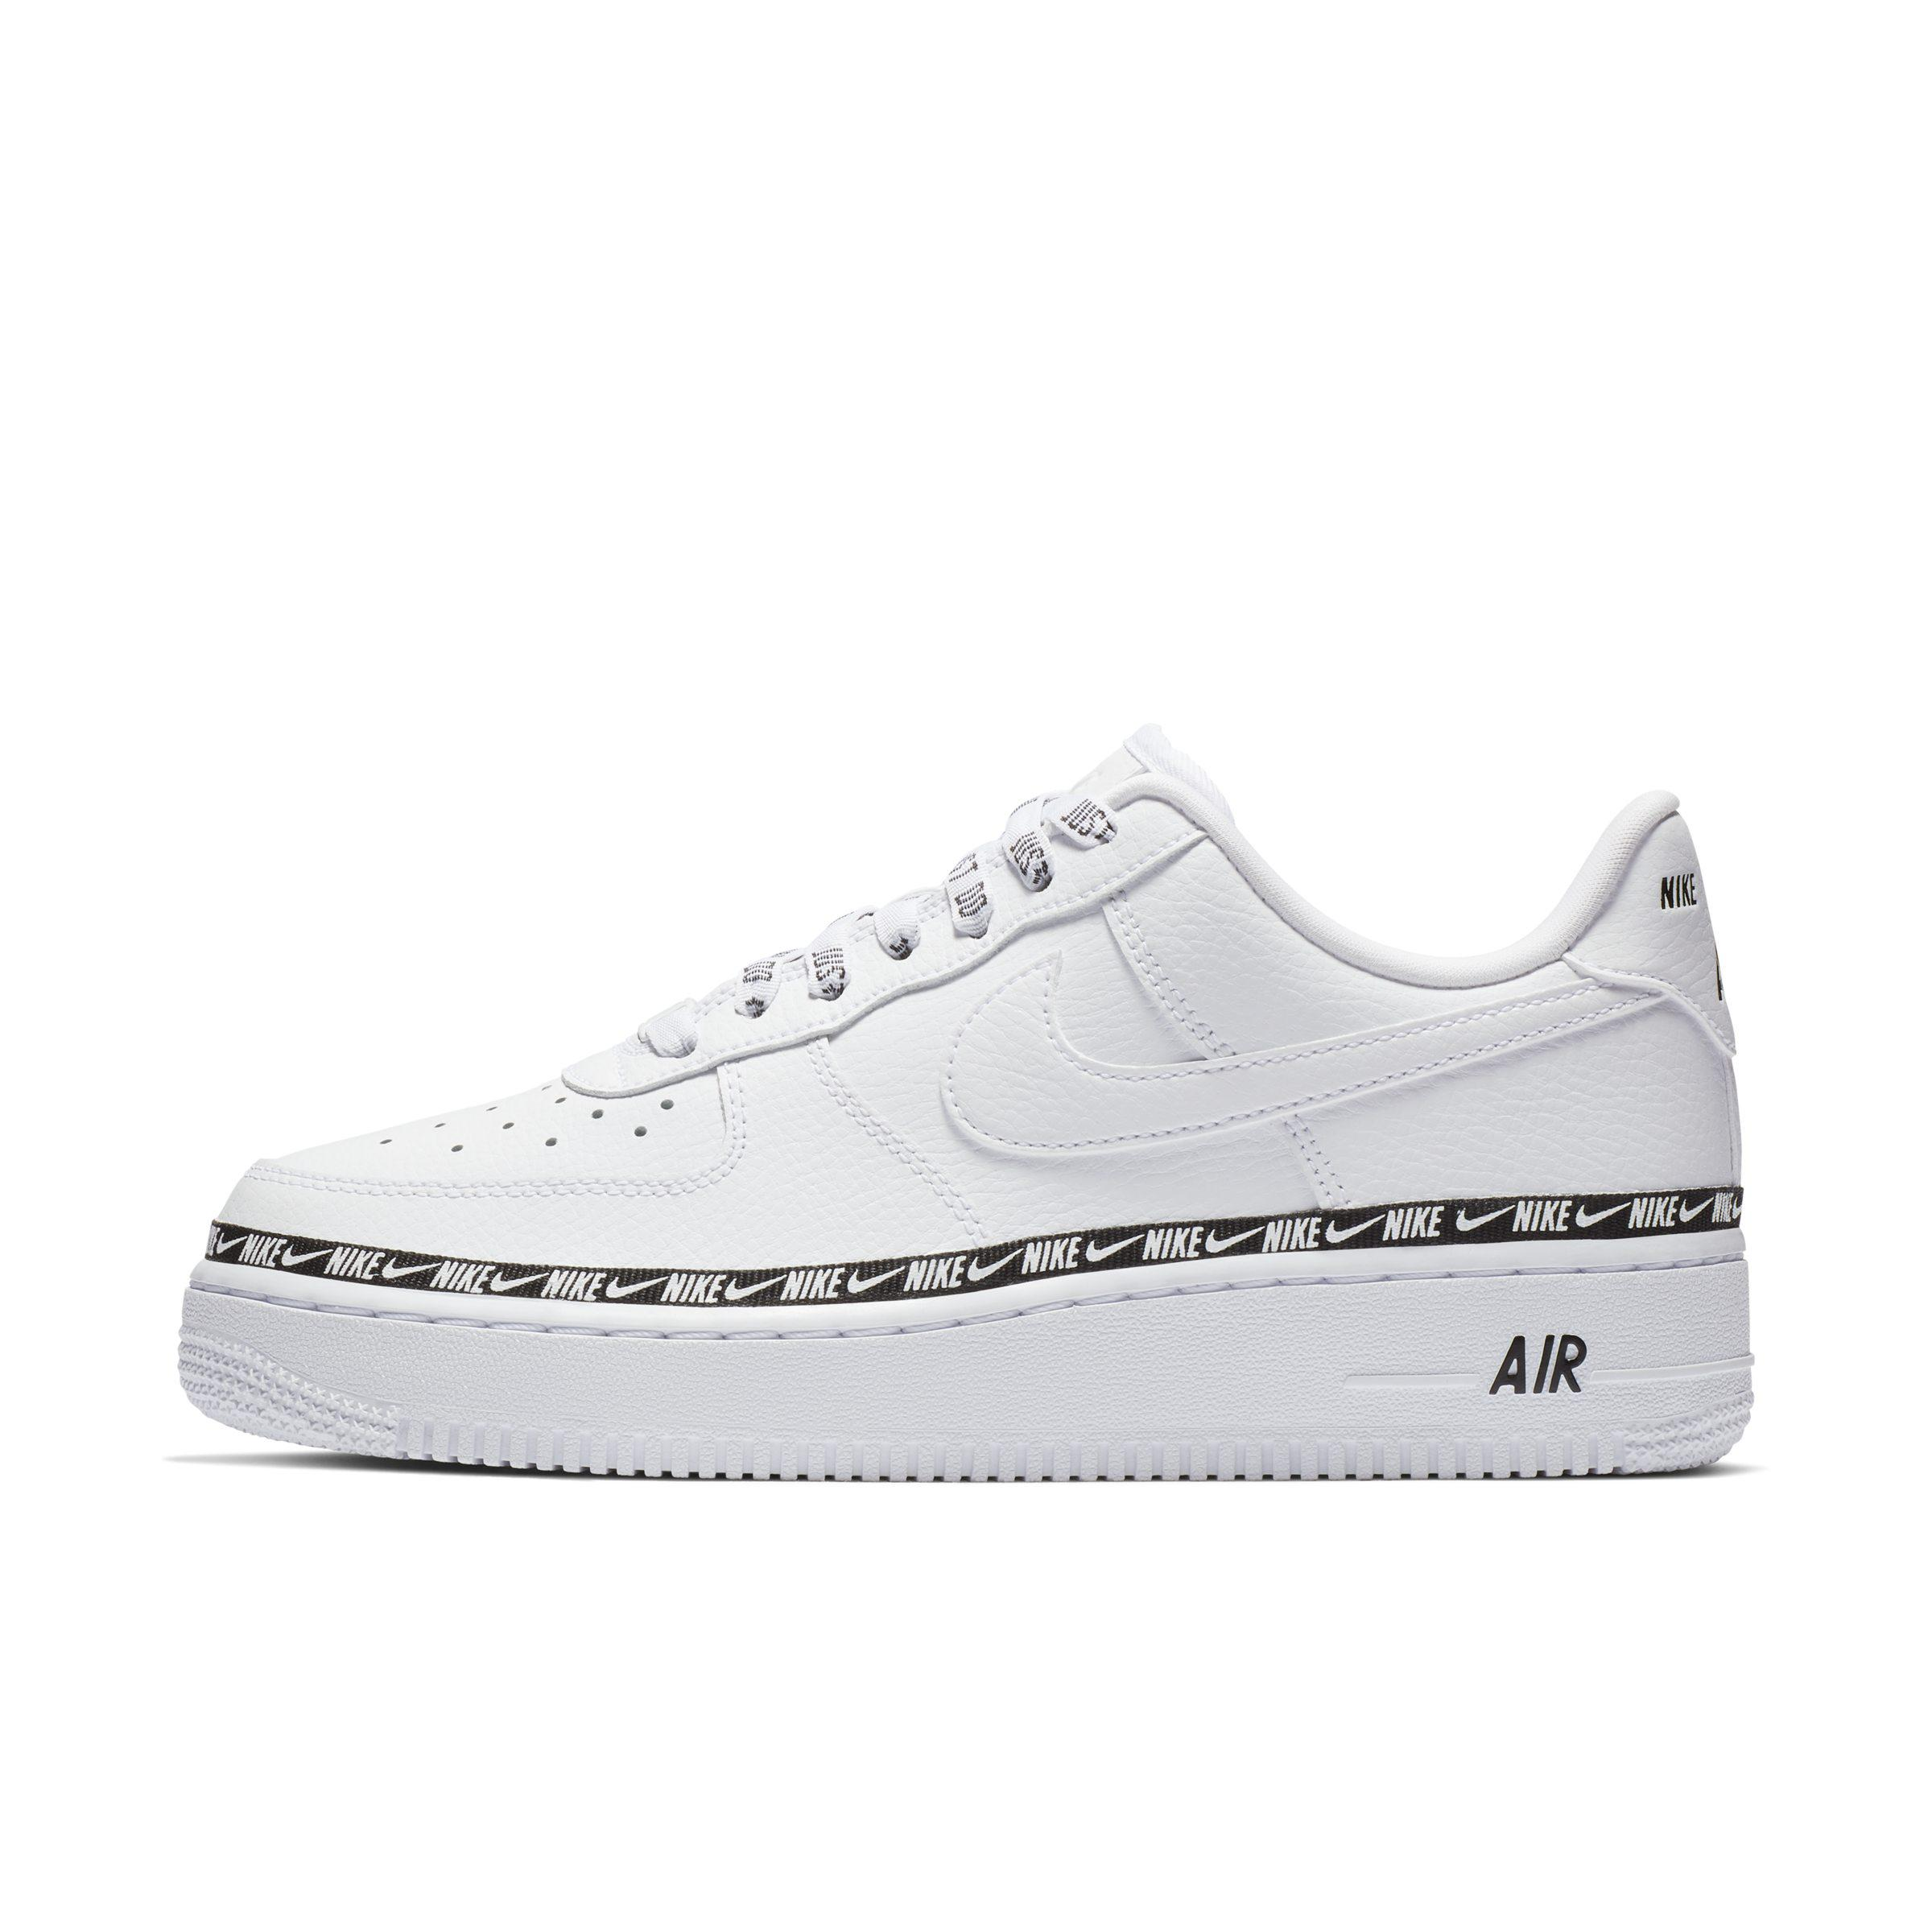 894967bfbcb Nike Air Force 1  07 Se Premium Shoe in White - Lyst